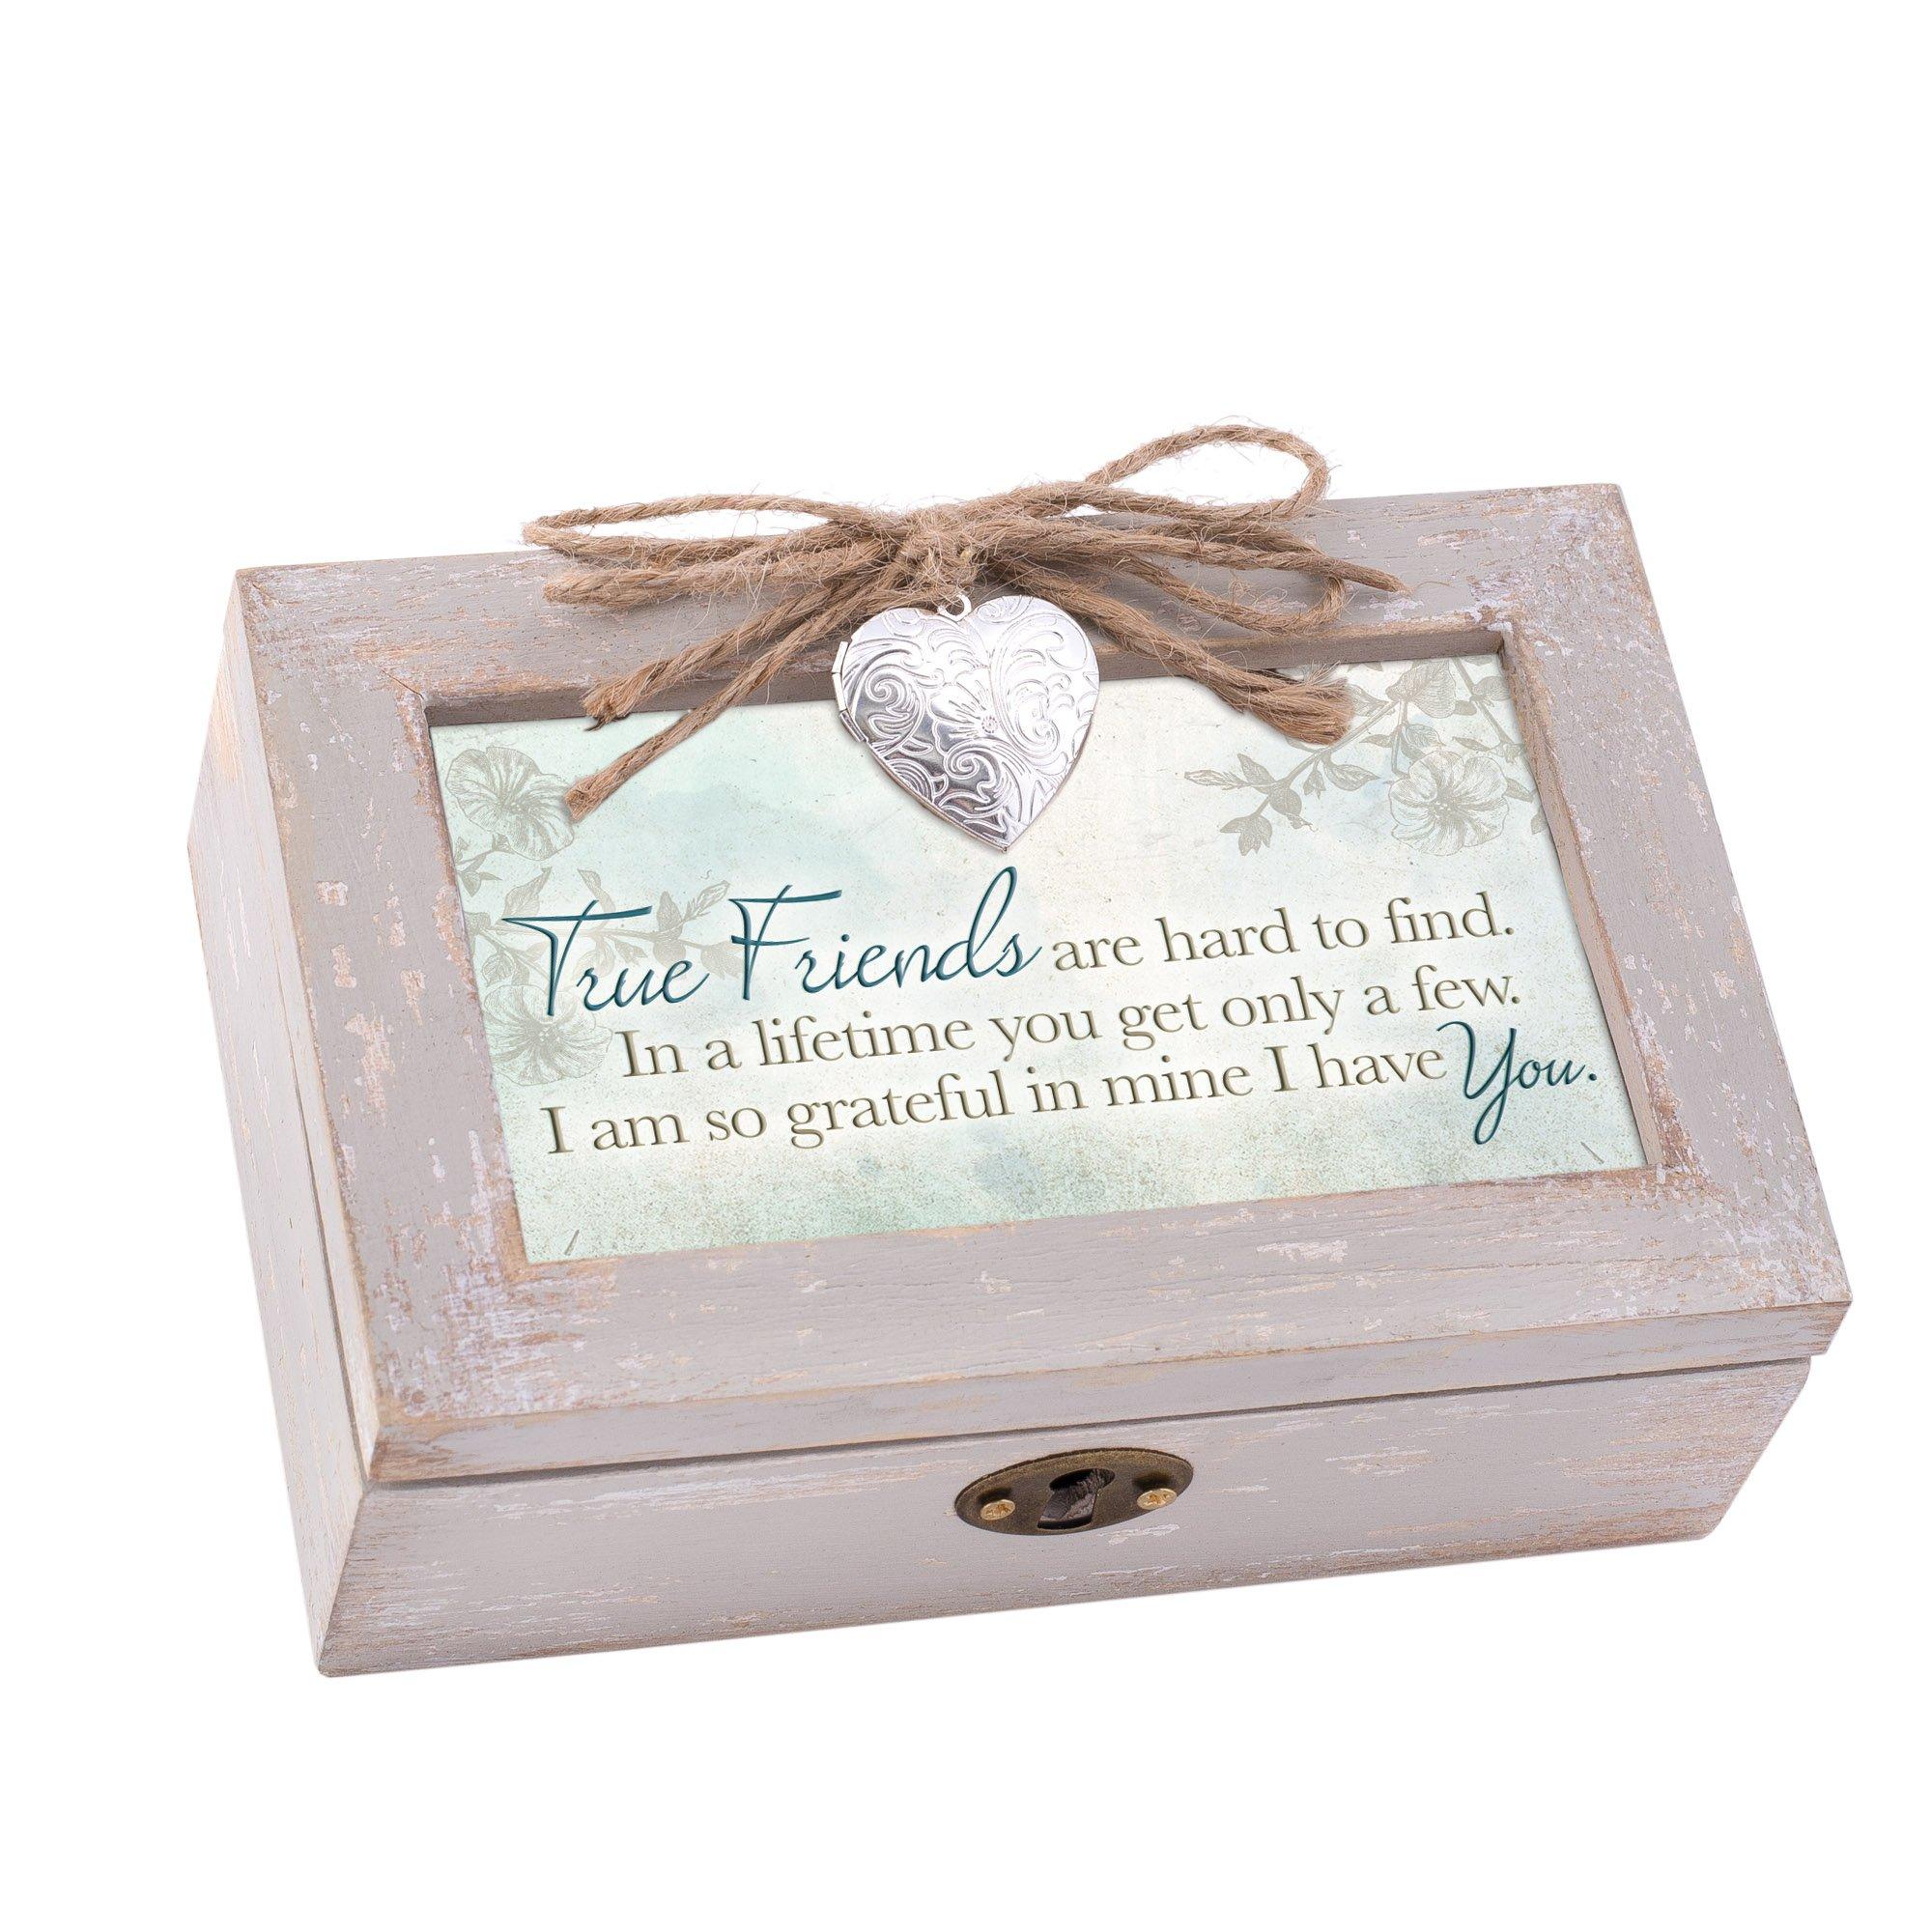 Cottage Garden True Friends Hard to Find Natural Taupe Jewelry Music Box Plays Wonderful World by Cottage Garden